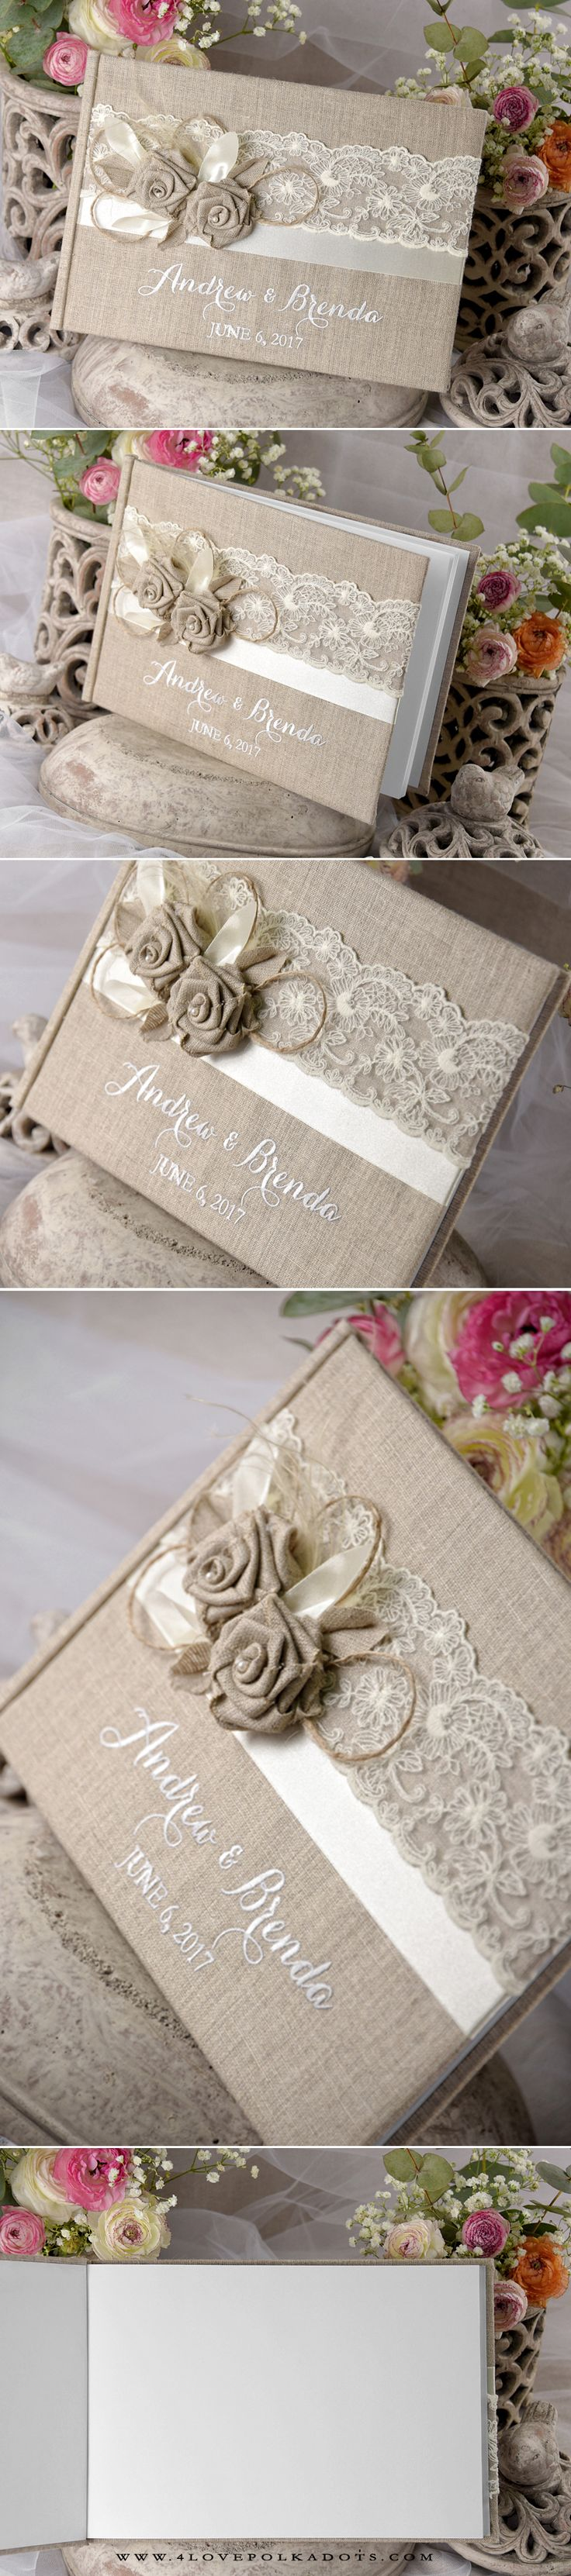 59 best Wedding images on Pinterest | Invitation cards, Wedding ...